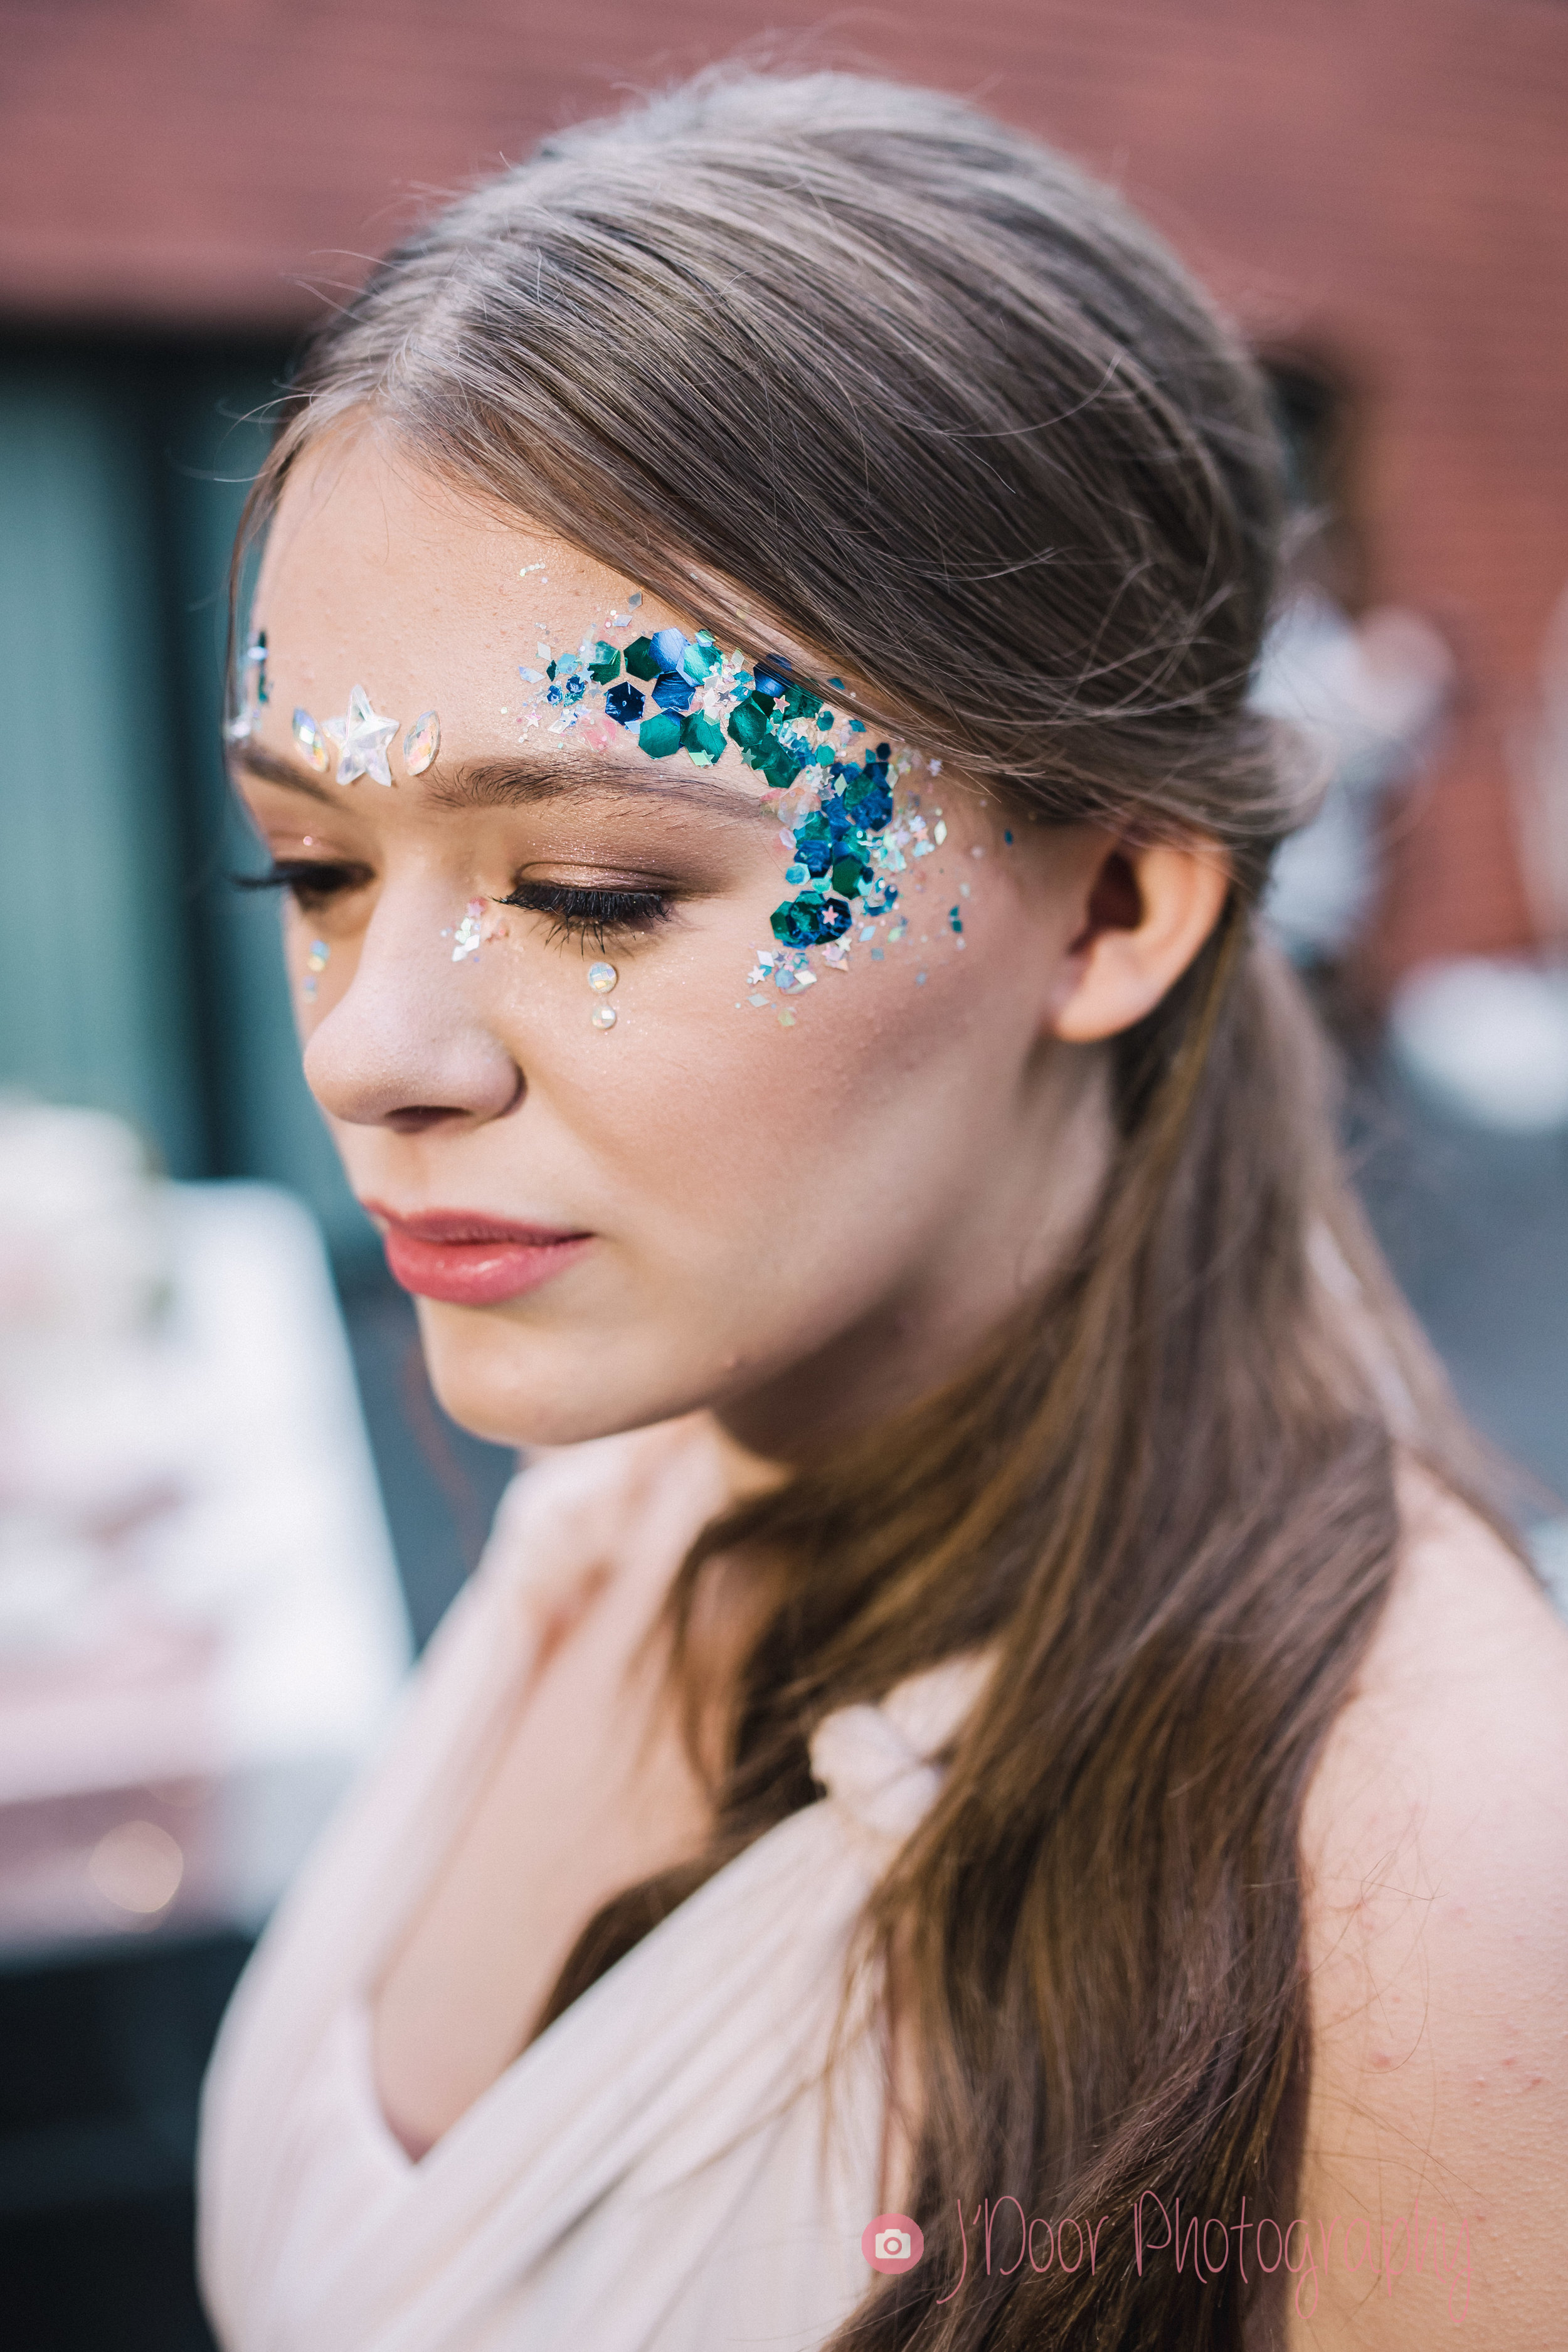 Makeup & Glitter Makeup by Toni Cassidy - Glamavan, Hair by Emma J Hair Styling, Model Billie.